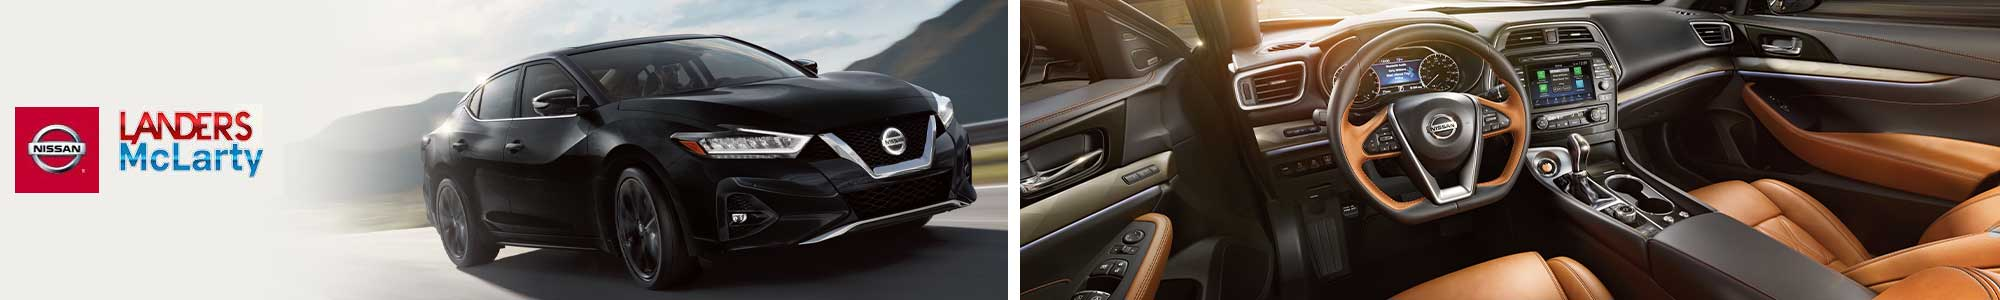 2020 Nissan Pathfinder Interior and Exterior